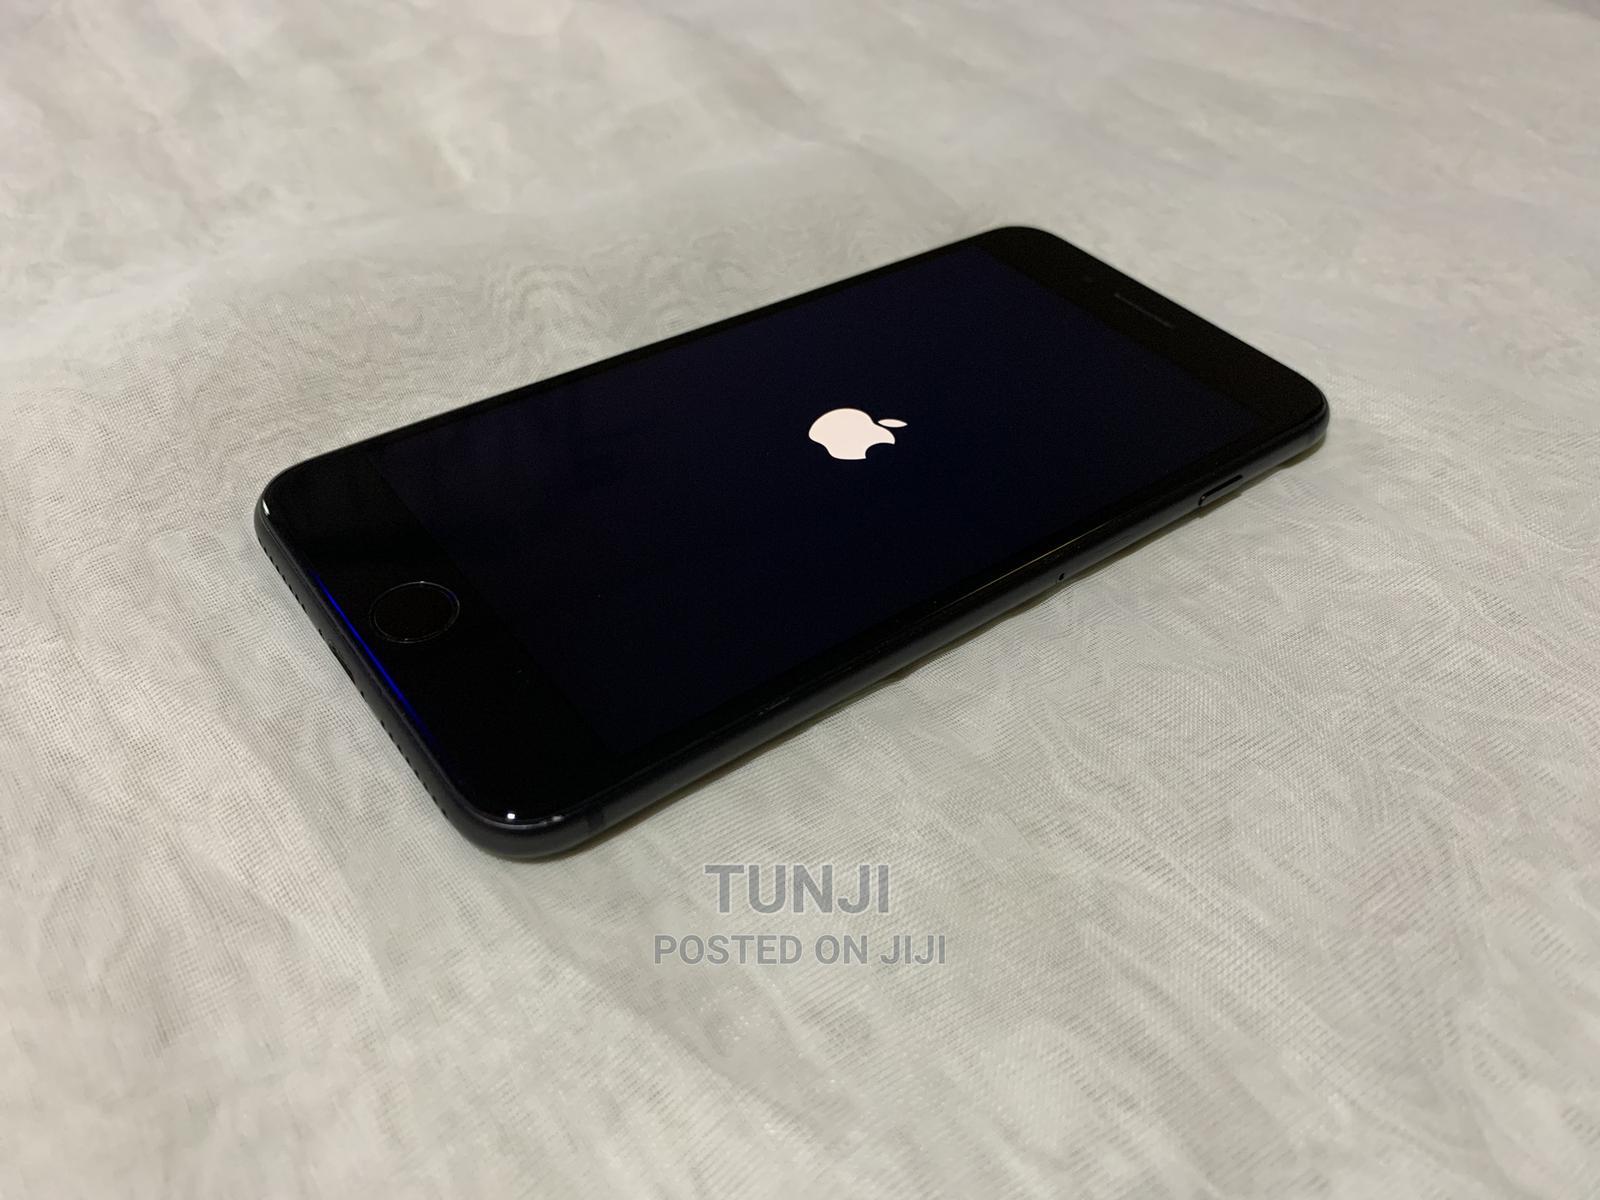 Apple iPhone 8 Plus 64 GB Black | Mobile Phones for sale in Ibadan, Oyo State, Nigeria